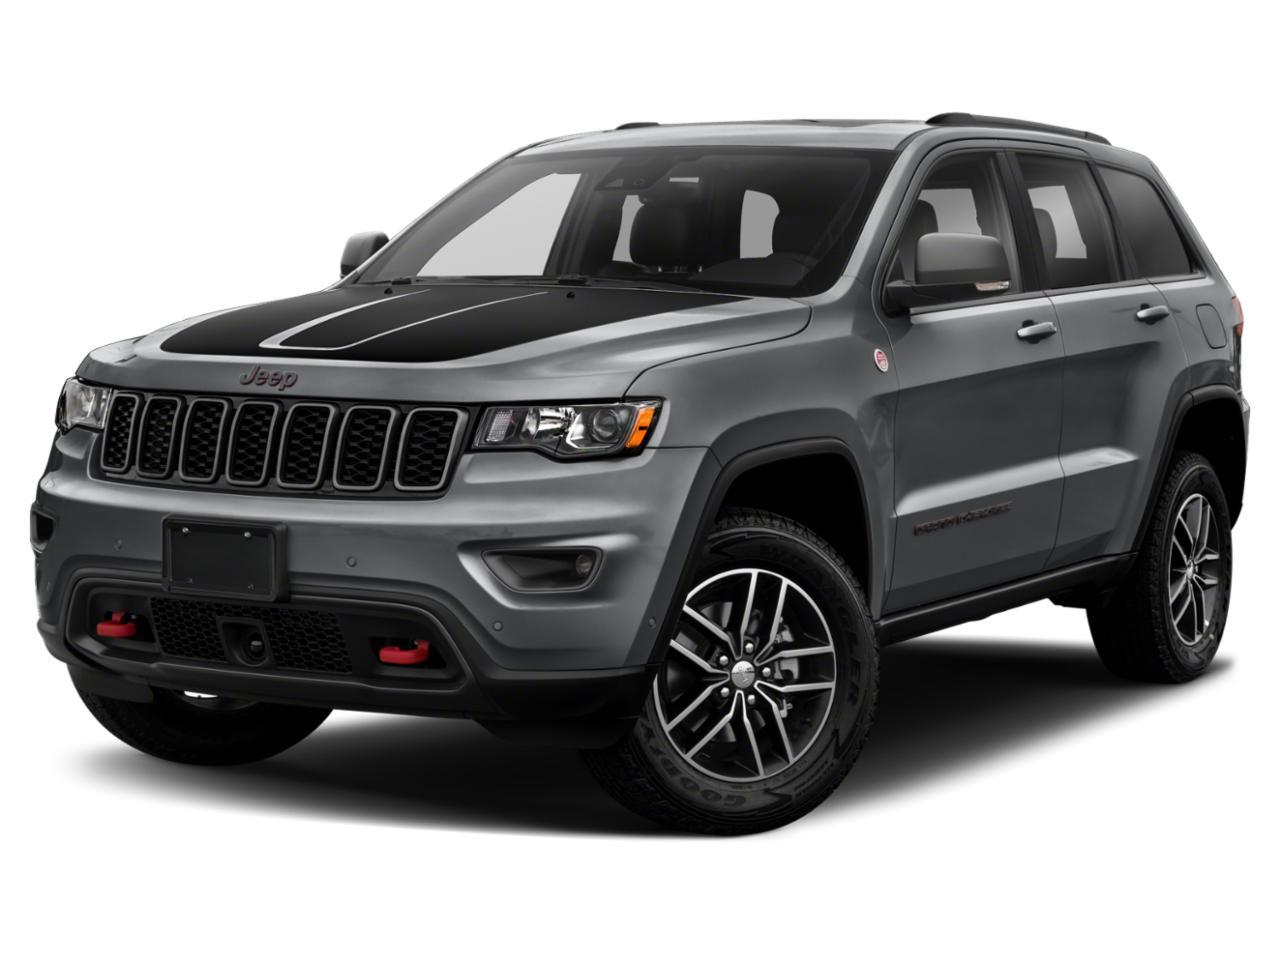 2020 Jeep Grand Cherokee Vehicle Photo in OAK LAWN, IL 60453-2517